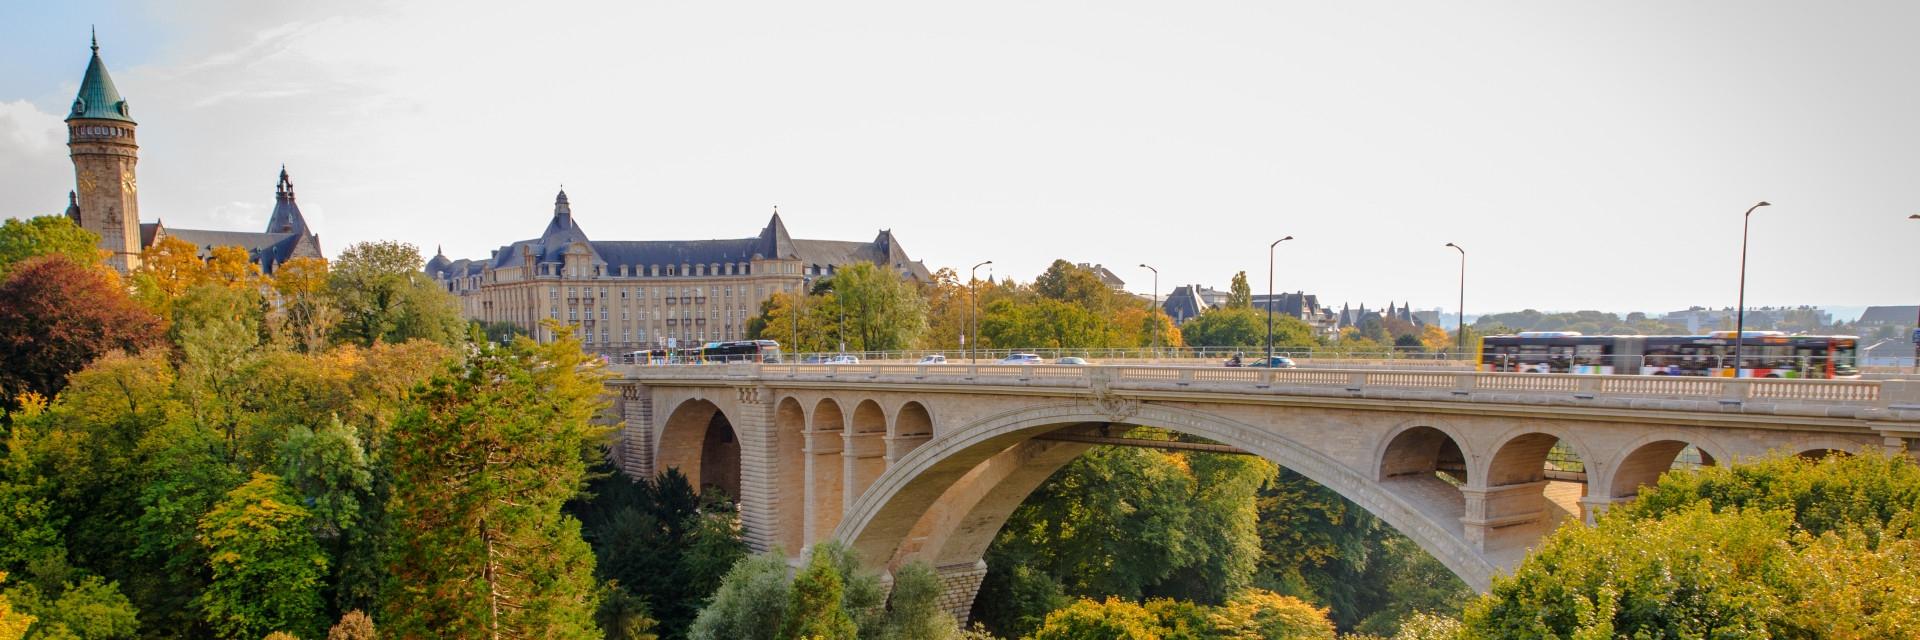 https://gody.vn/blog/hang93003/post/kinh-nghiem-du-lich-luxembourg-tu-tuc-9035